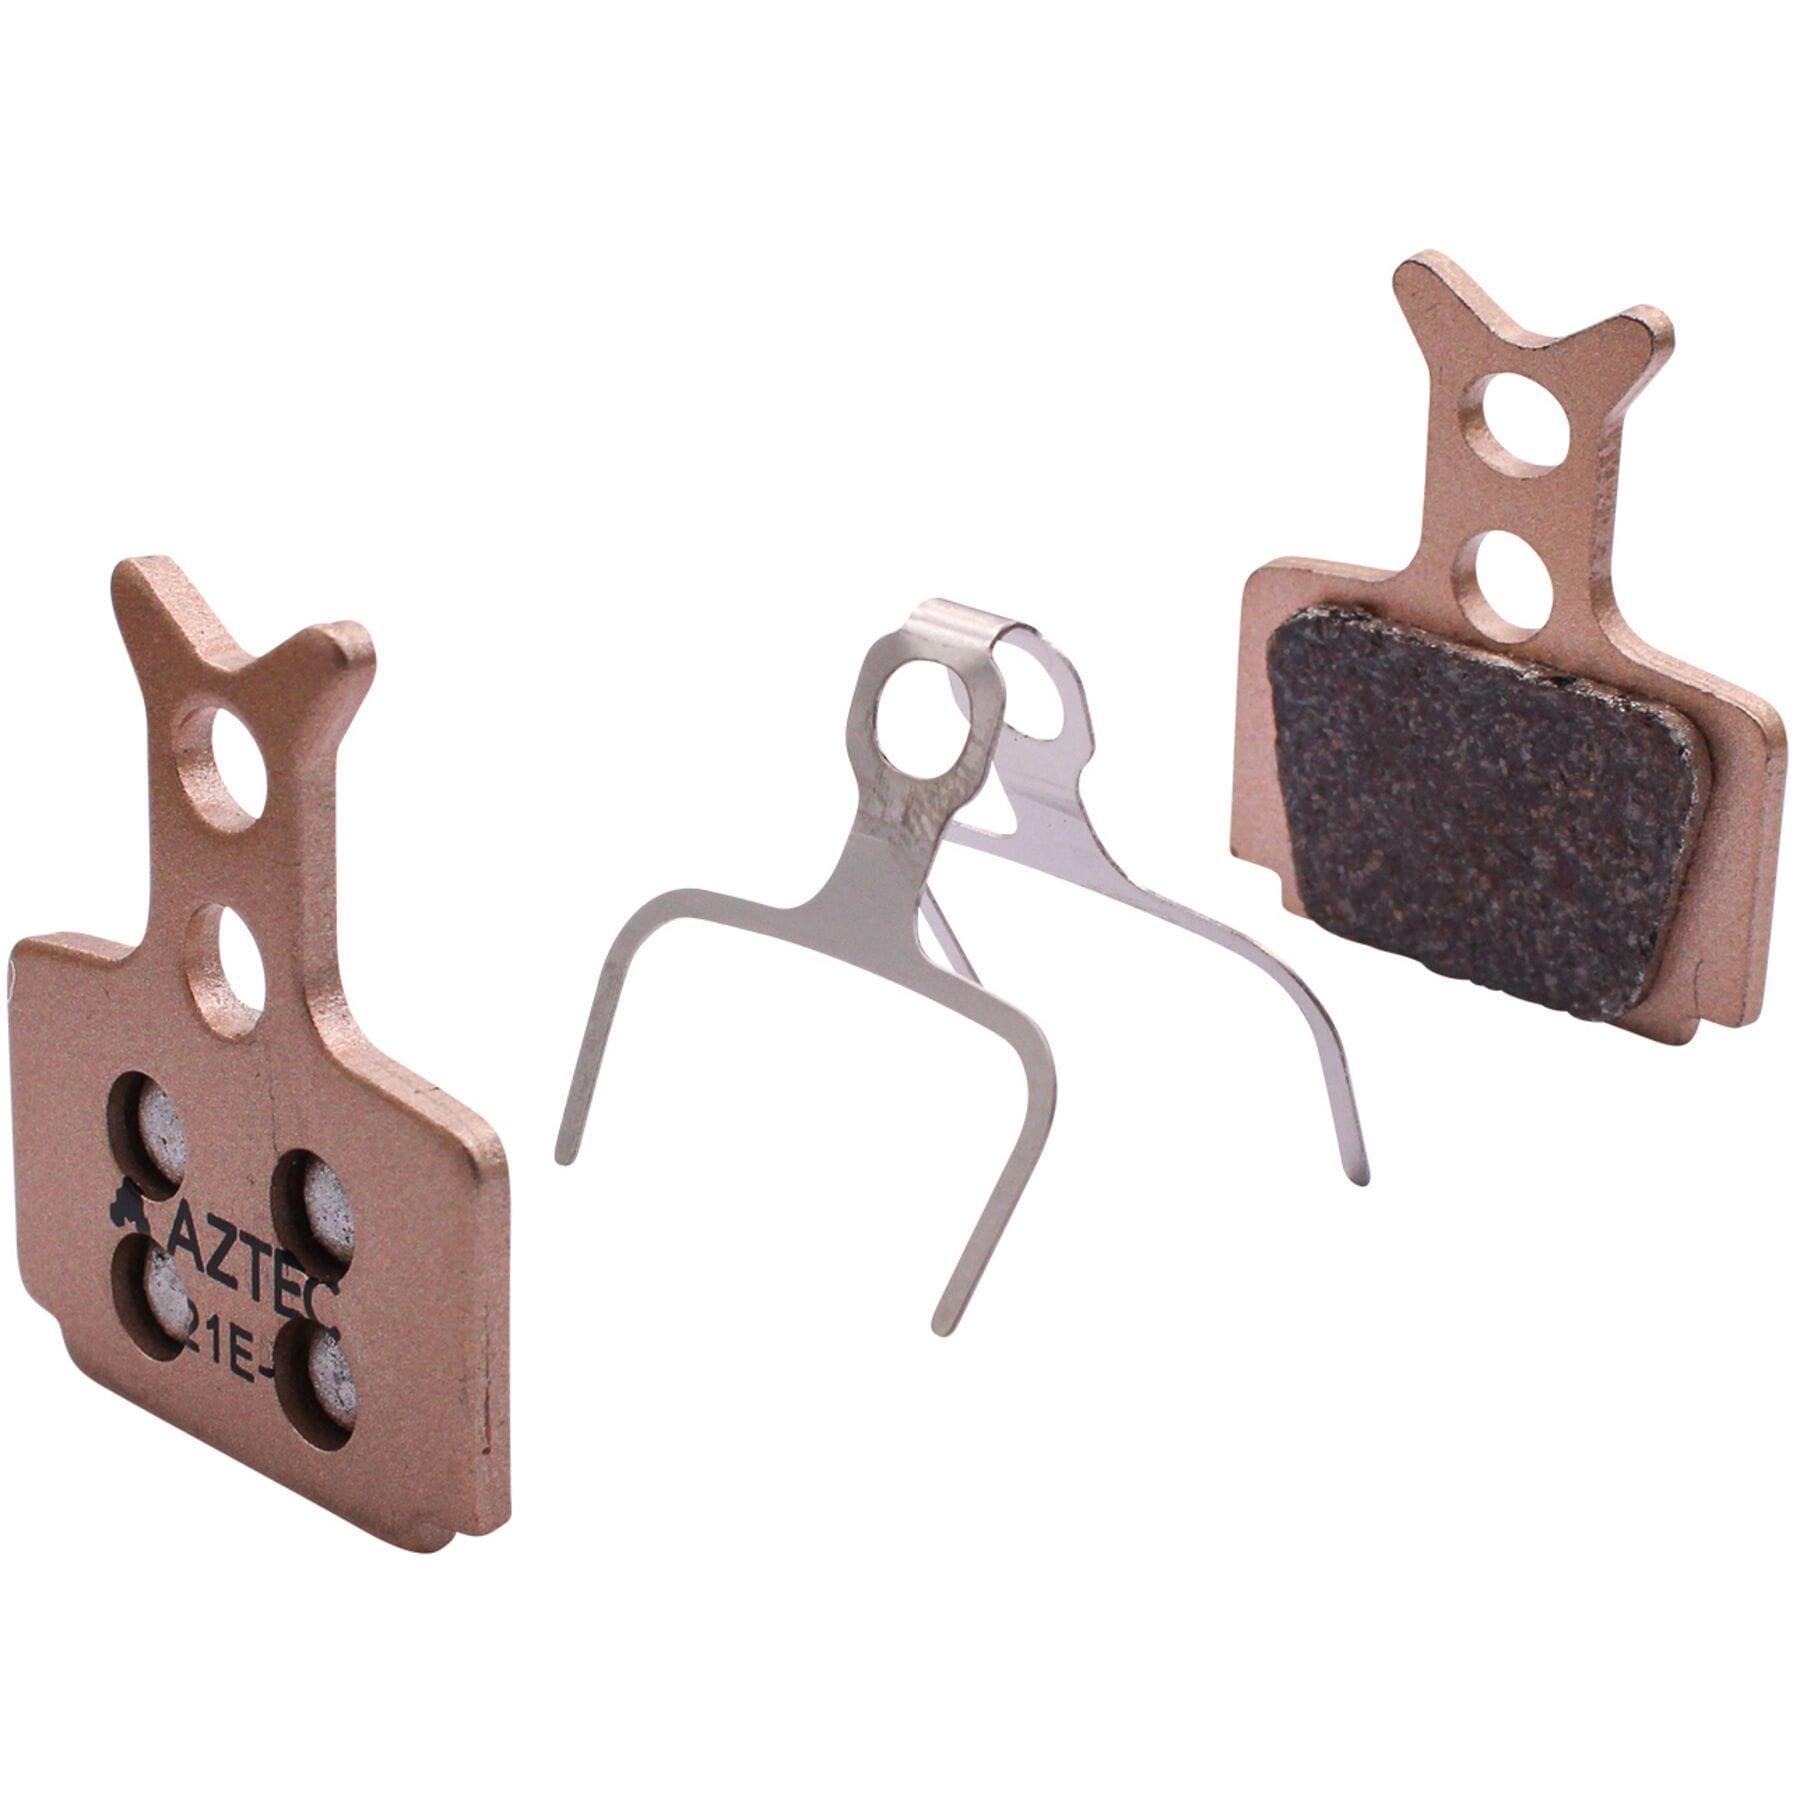 Aztec Sintered disc brake pads for Formula Oro Mega | Brake pads